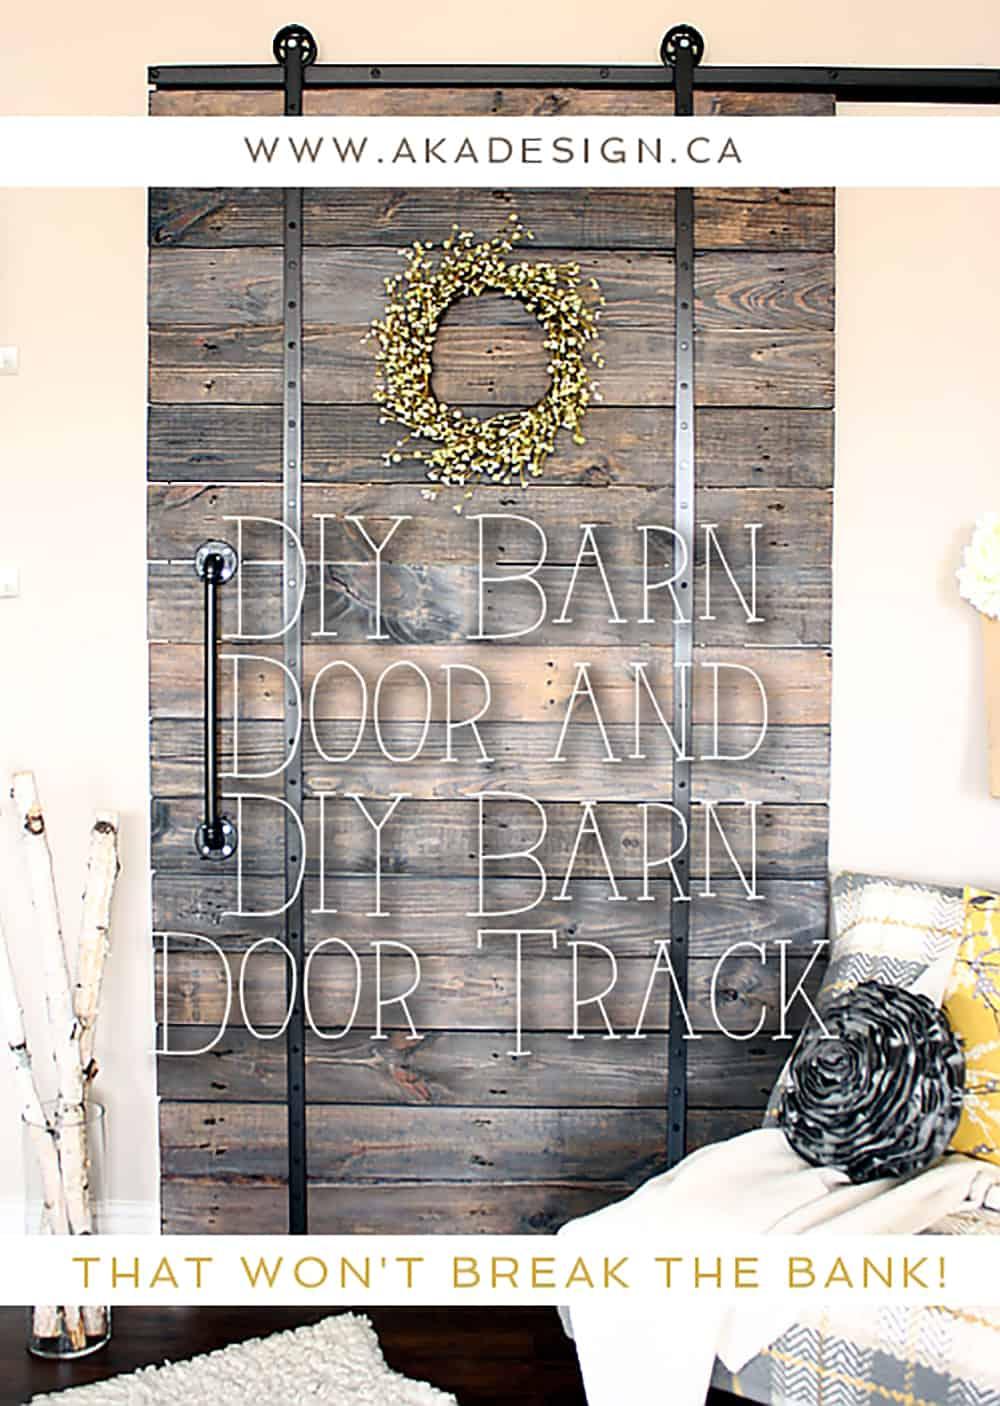 DIY BARN DOOR AND DIY BARN DOOR TRACK THAT WONu0027T BREAK THE BANK & DIY Barn Door and DIY Barn Door Track That Wonu0027t Break the Bank! pezcame.com